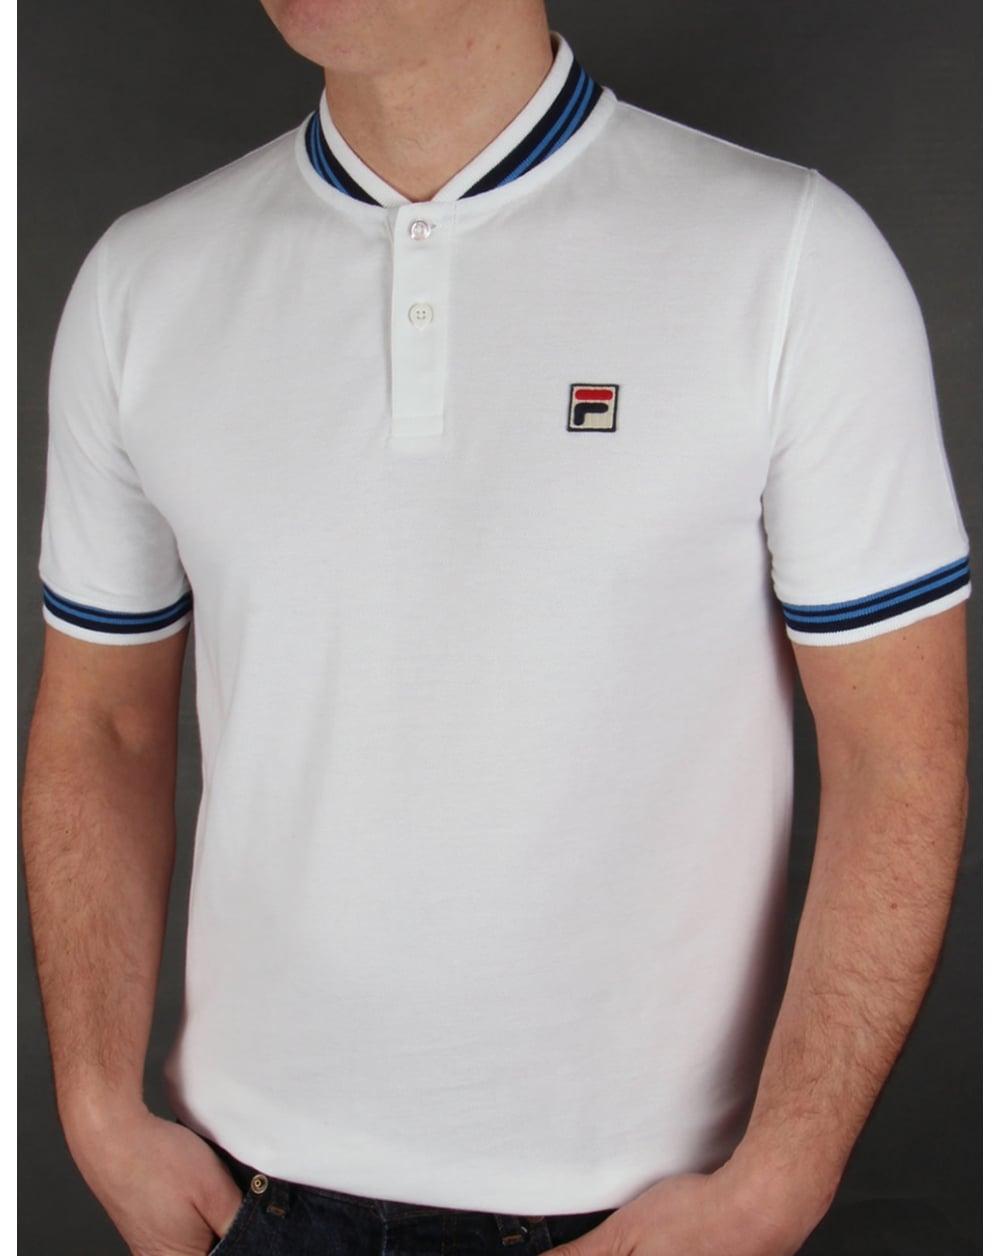 MENS FILA VINTAGE Magliette Classic Pique Polo Shirt Tee T